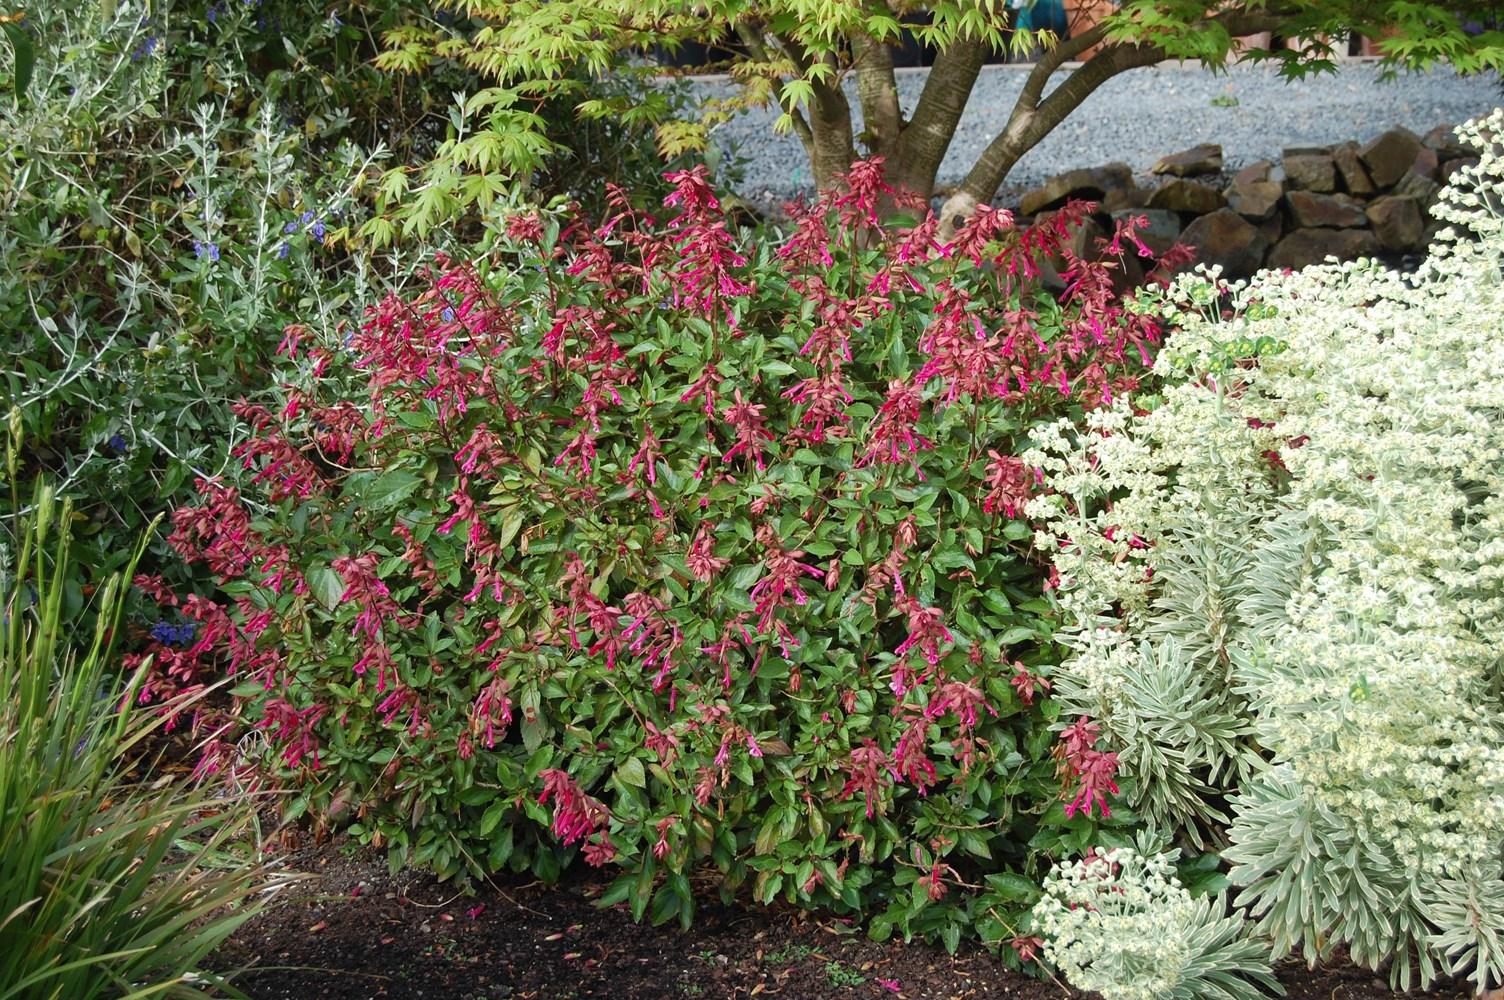 Website/Plants/1251814044/Images/Gallery/s_wendyswish_02.0.jpg